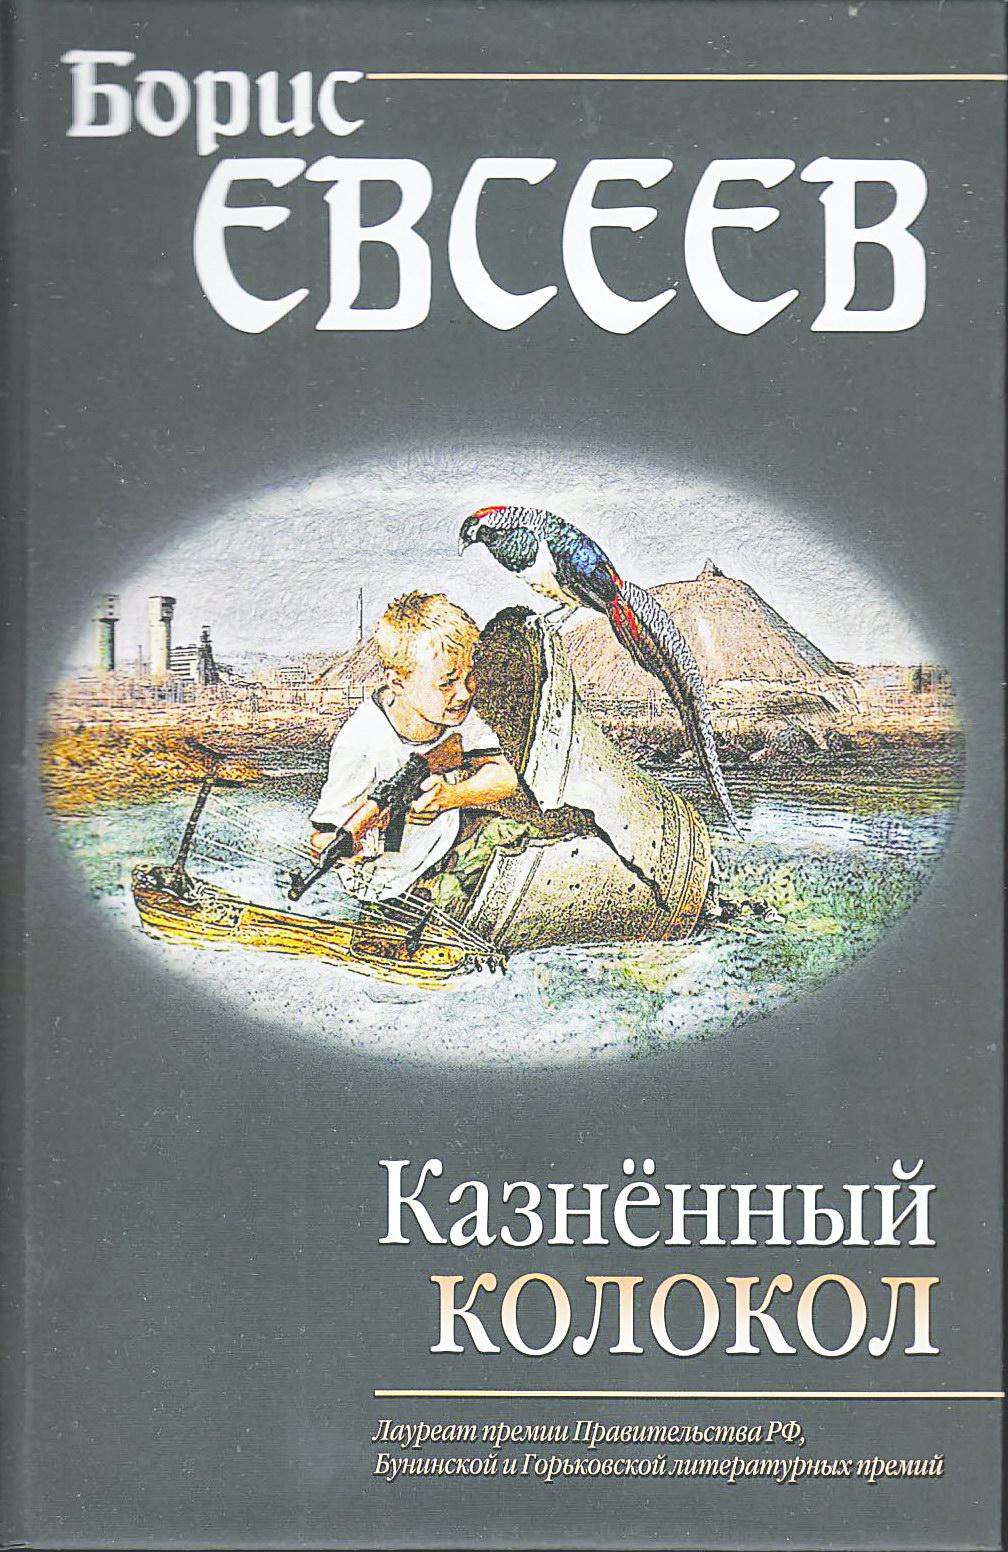 11 Evseev Kolokol